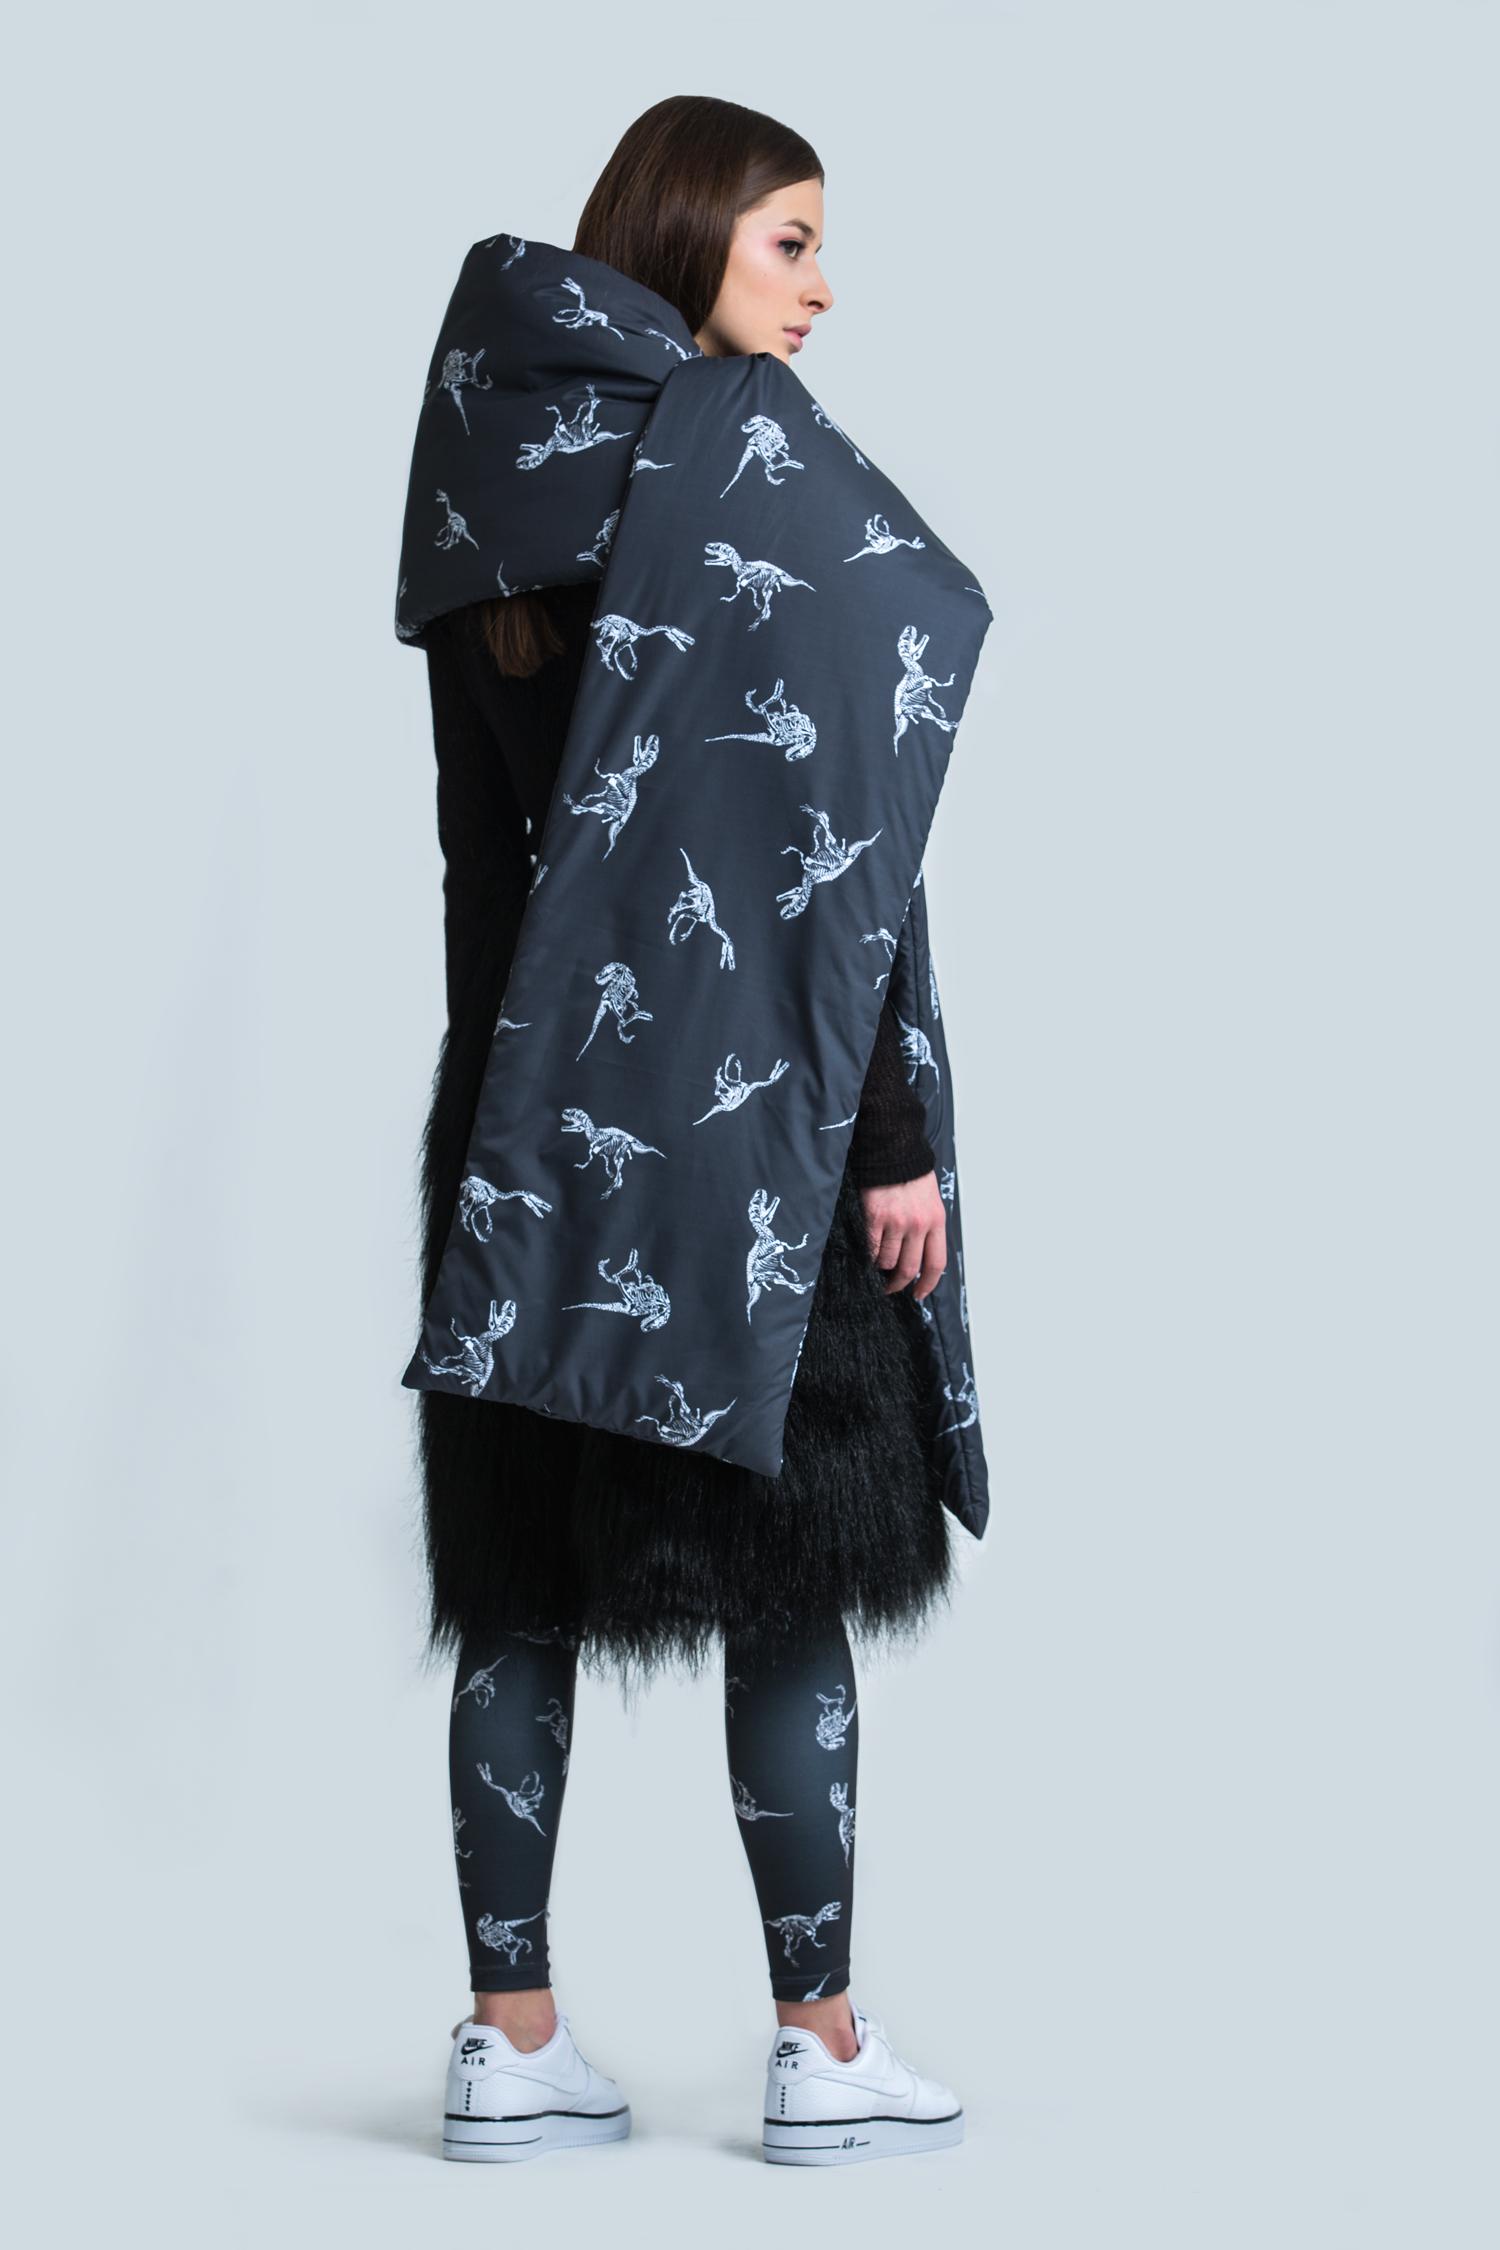 teaser-scarf.jpg